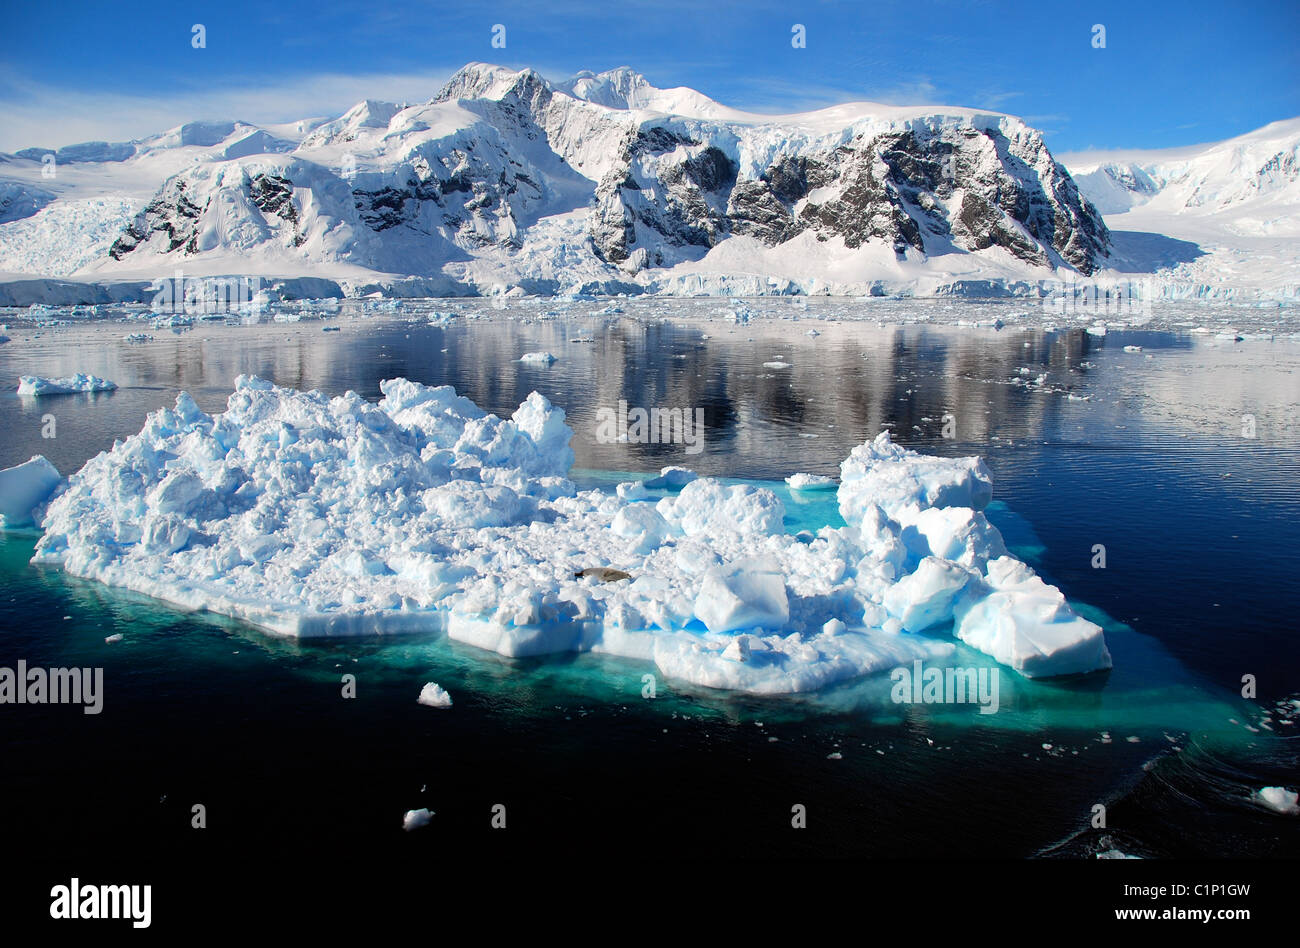 iceberg in antarctic landscape - Stock Image